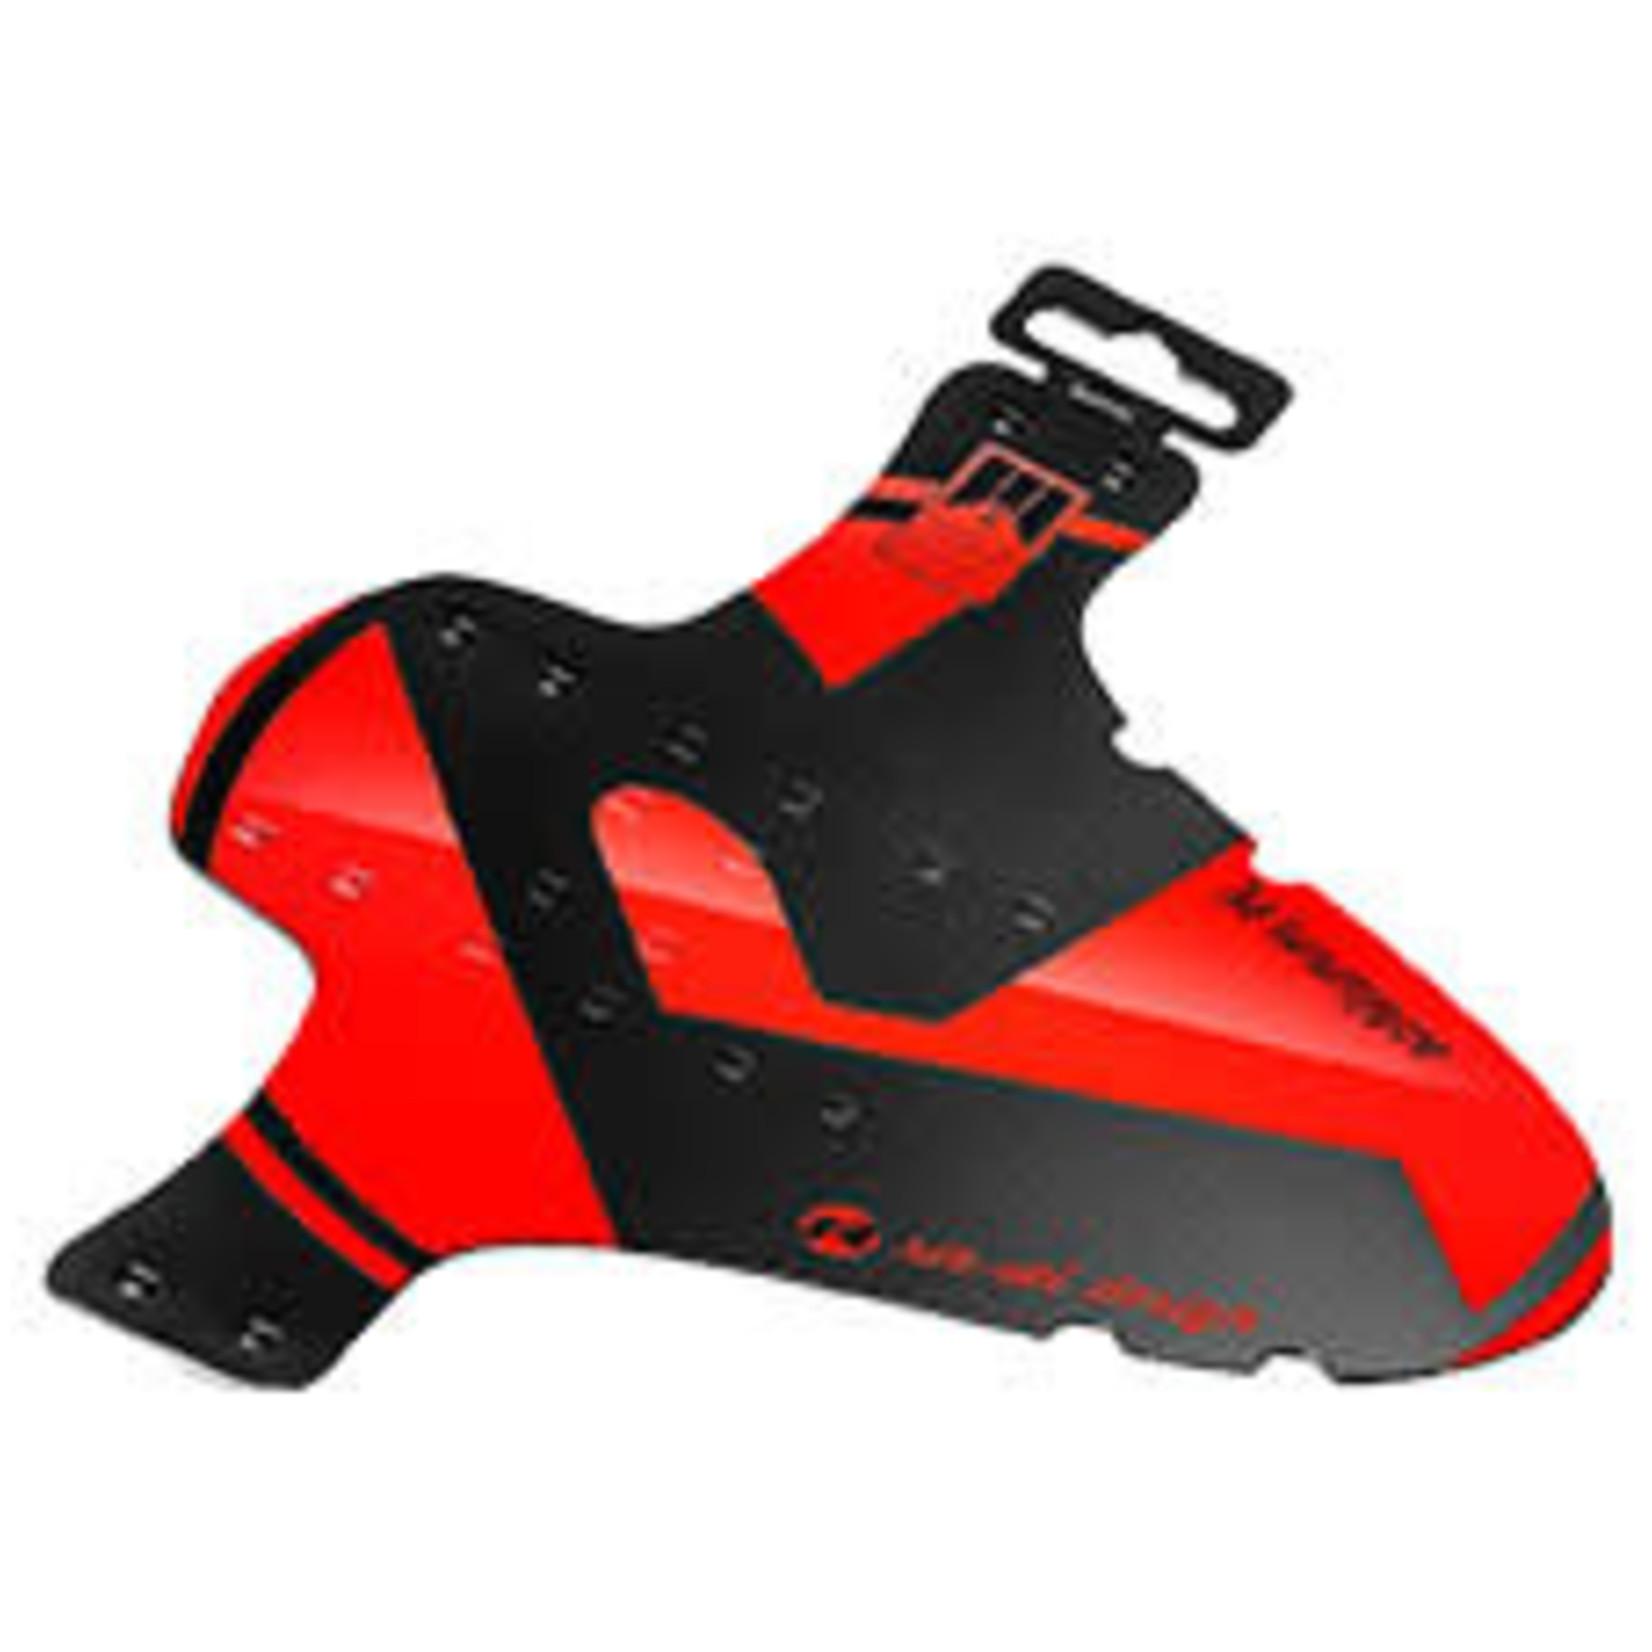 Rie Sel Design Schutzbleche Vorne a Fascette Mudguard - rosso